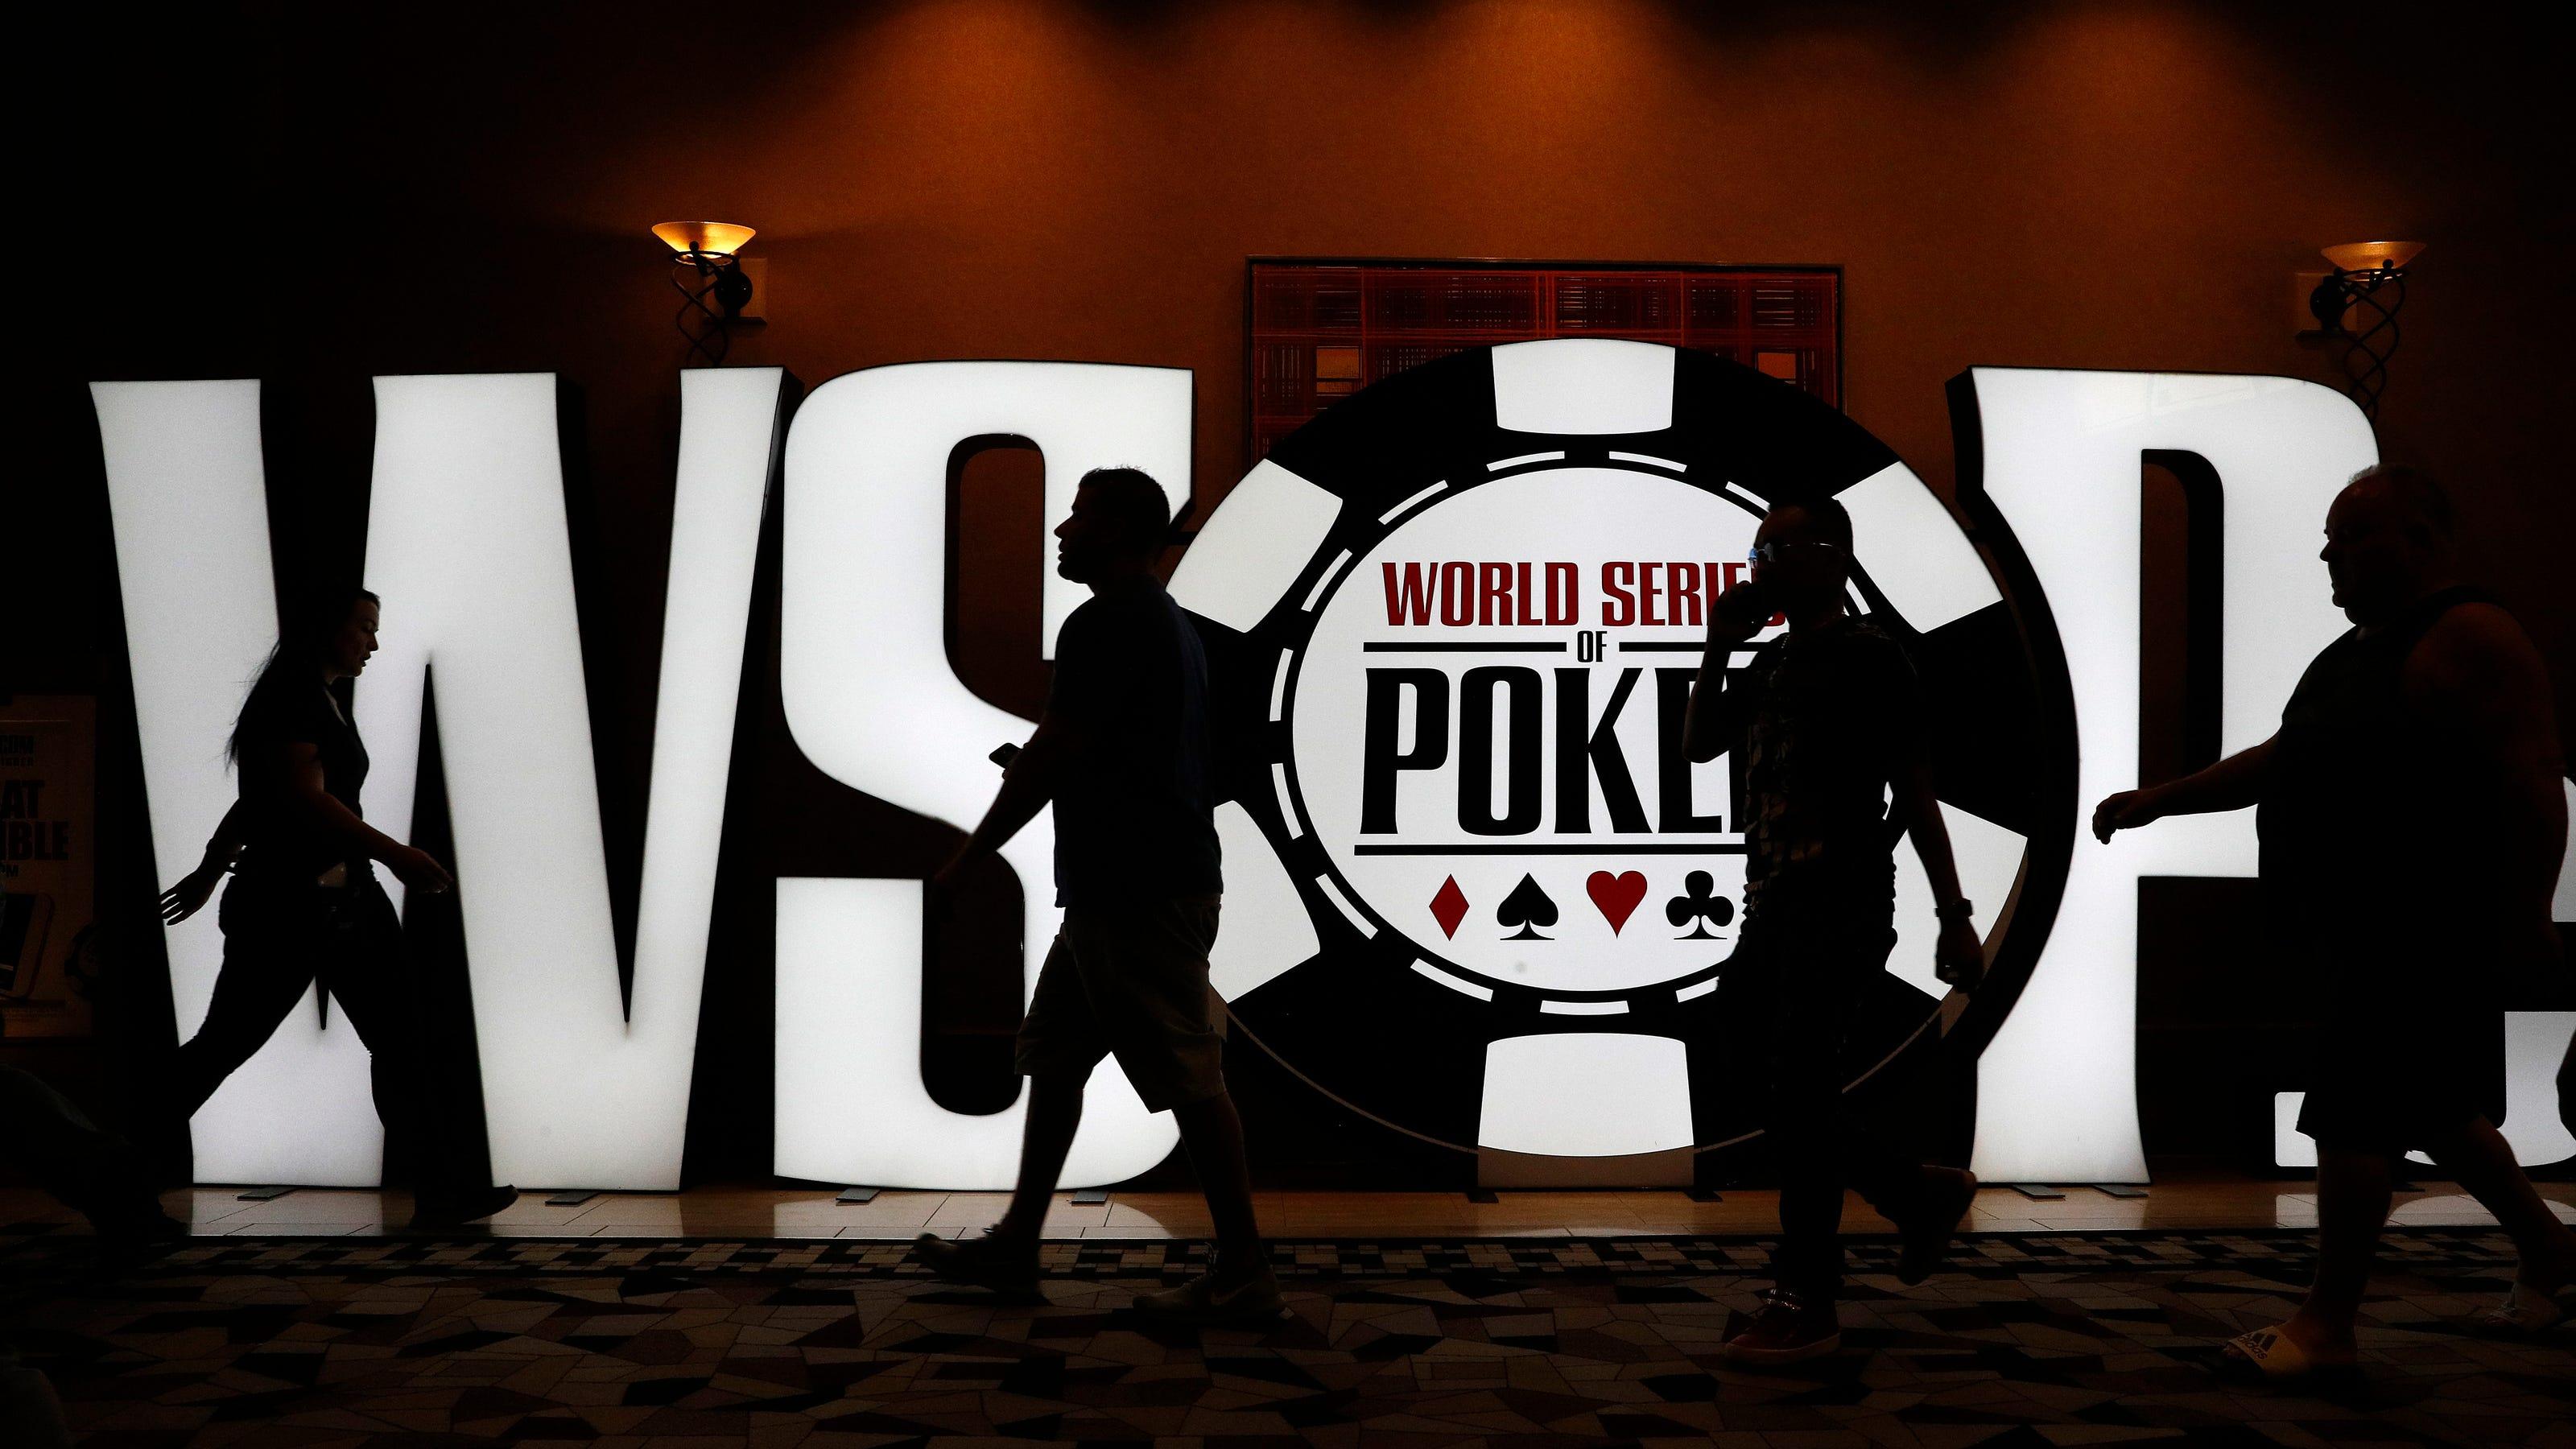 3 way all in poker